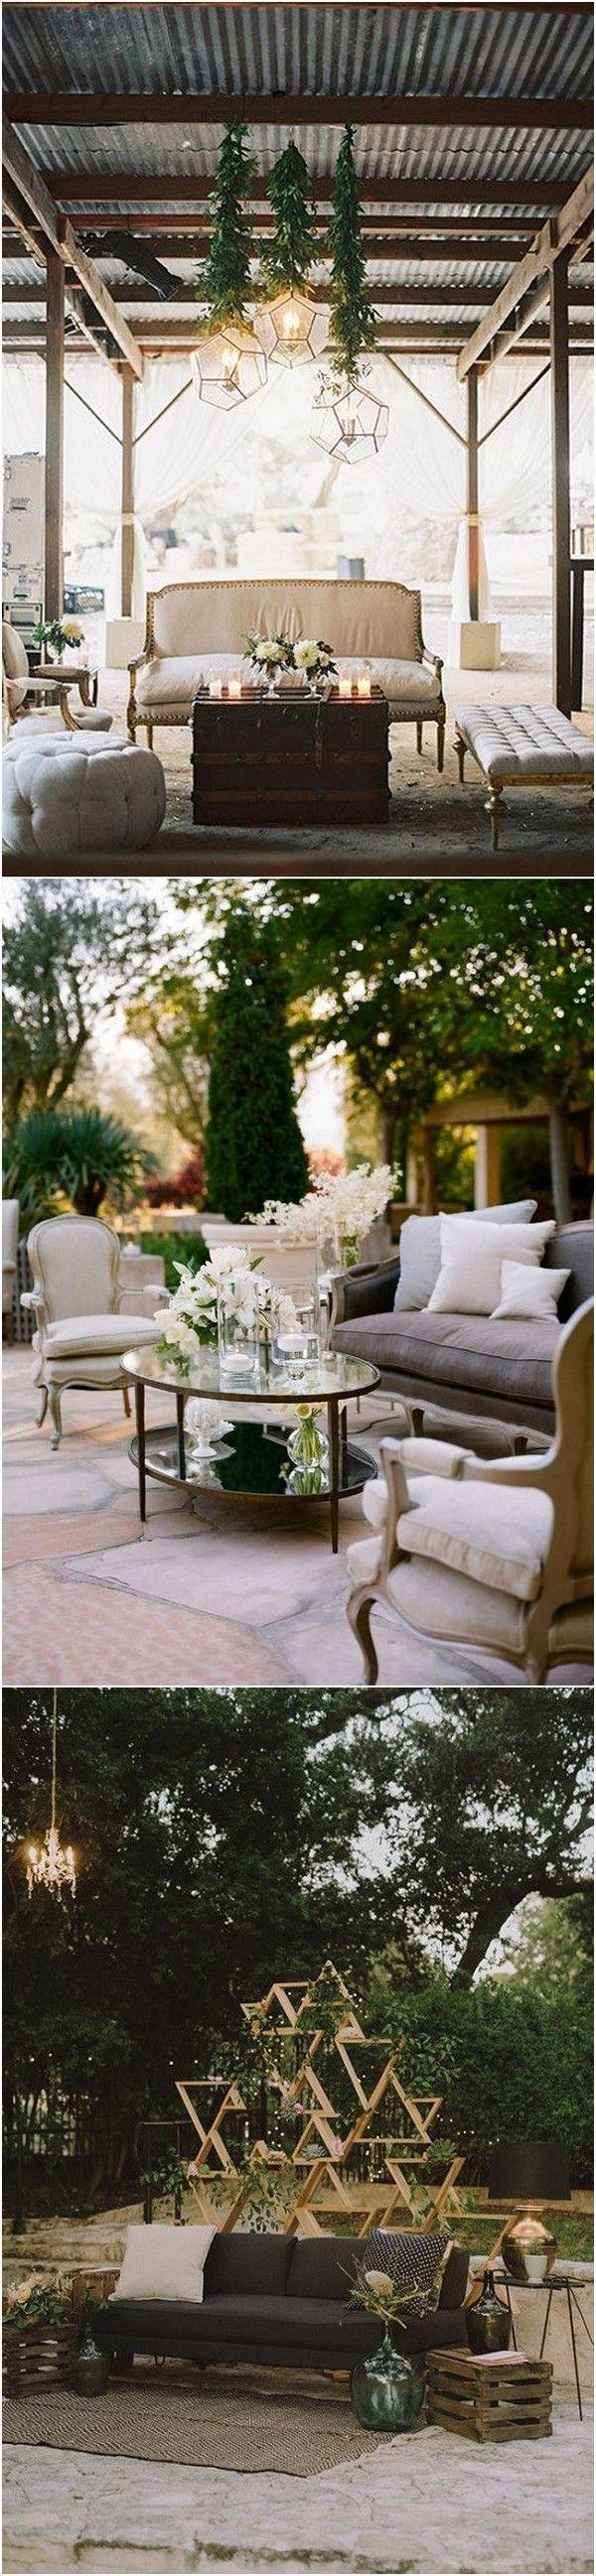 Rustic Chic Wedding Reception Lounge Area Ideas #wedding #weddingideas #weddingdecor